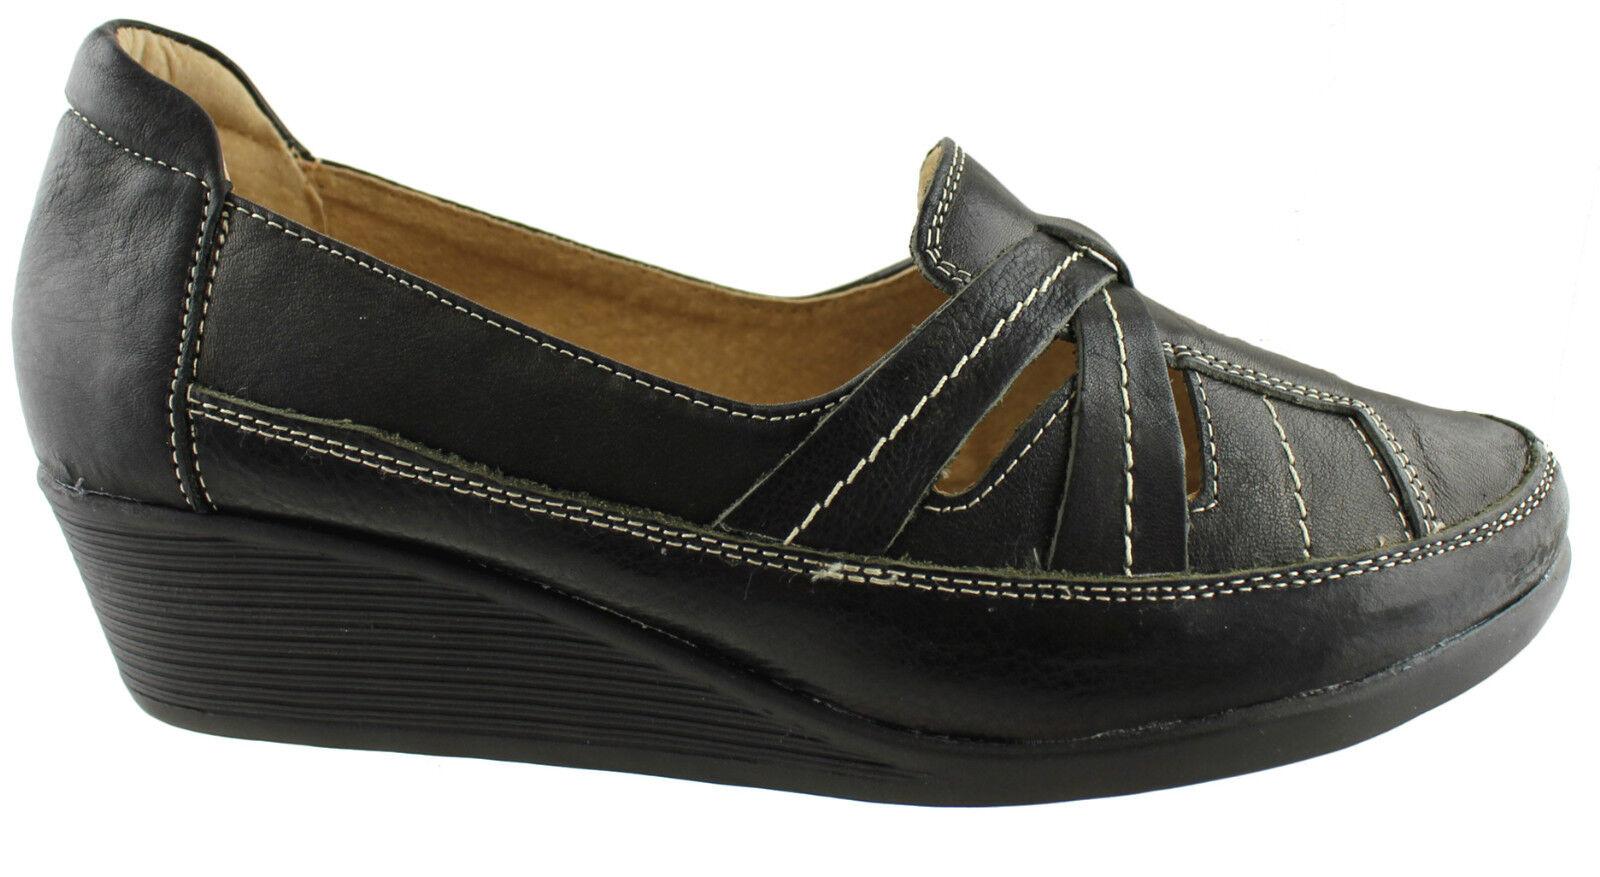 Cojín Cuña confort Carie Mujer/ladies Cuña Cojín confort Zapatos/casuals/slip Ons 891445